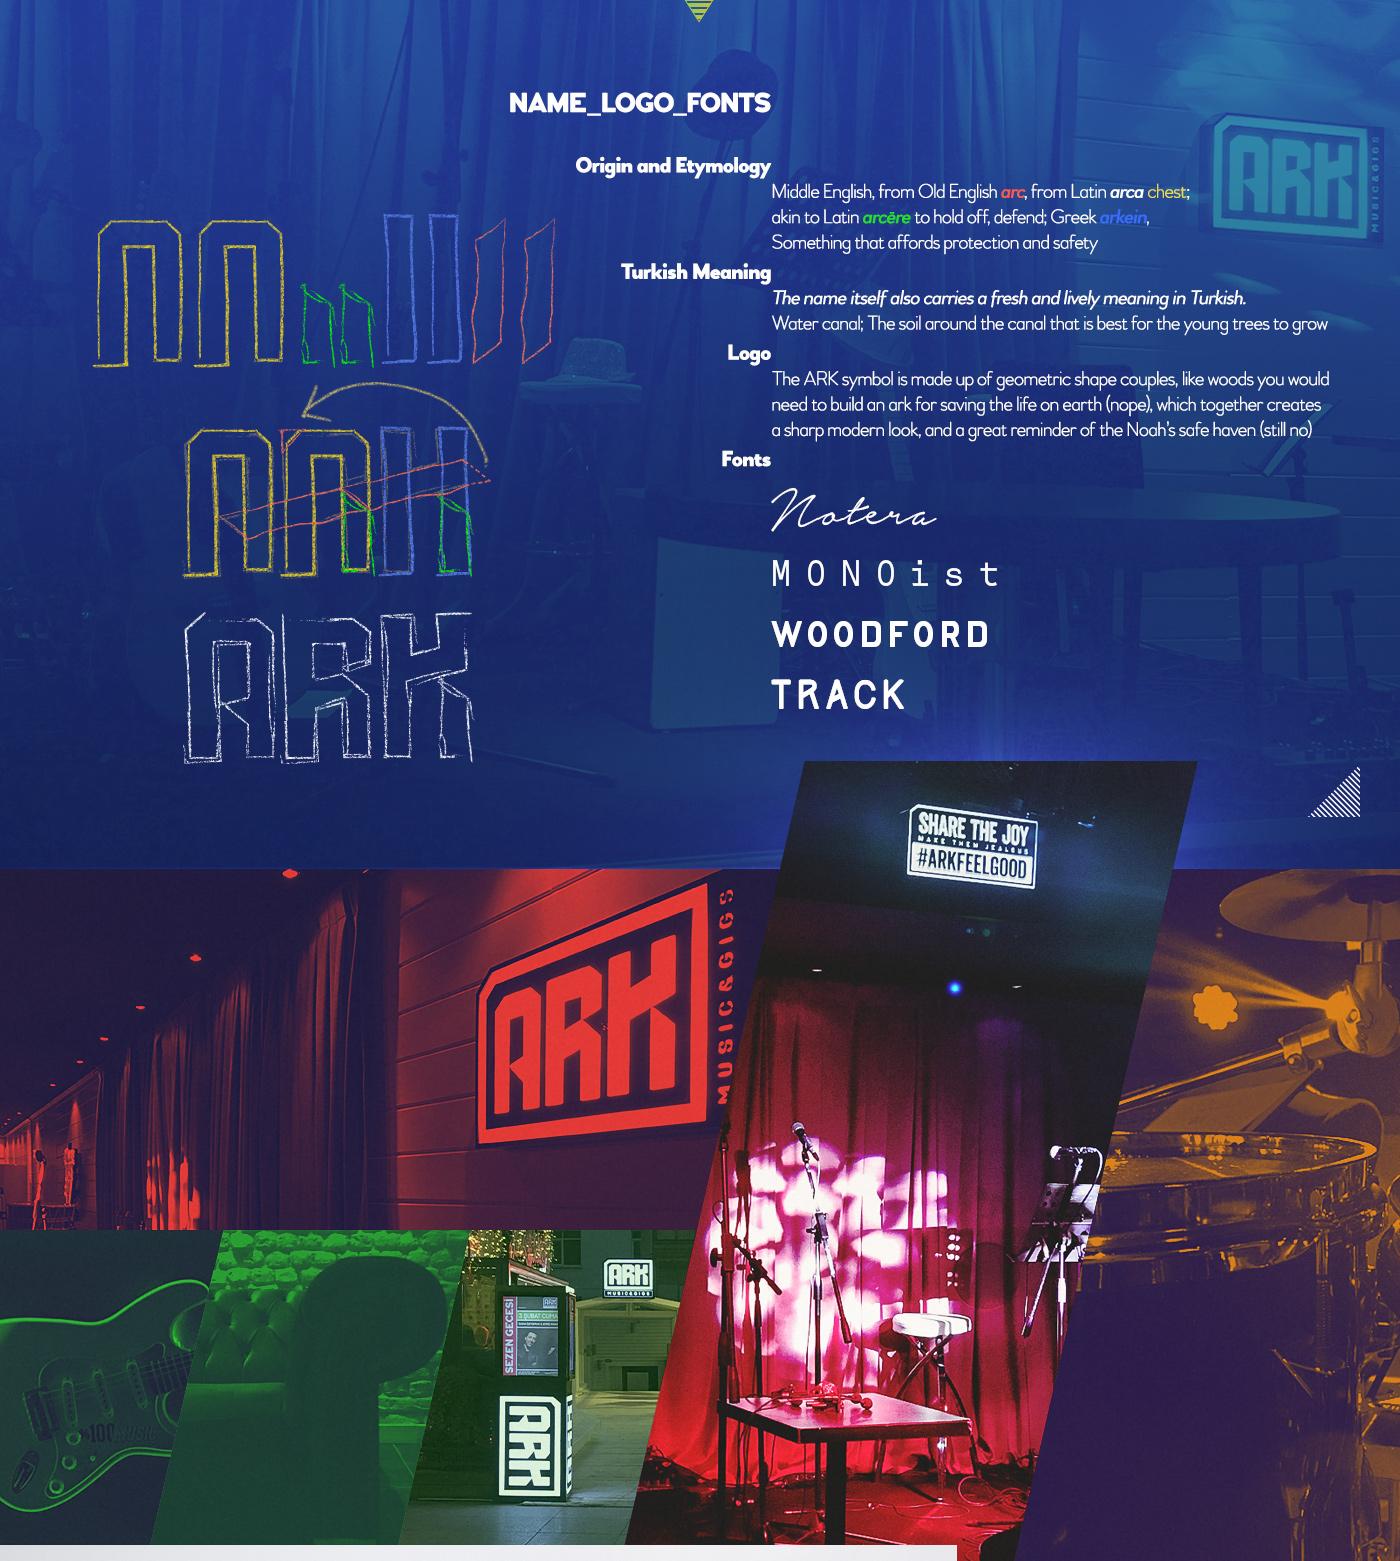 ark club gig Entertainment concert live music venue